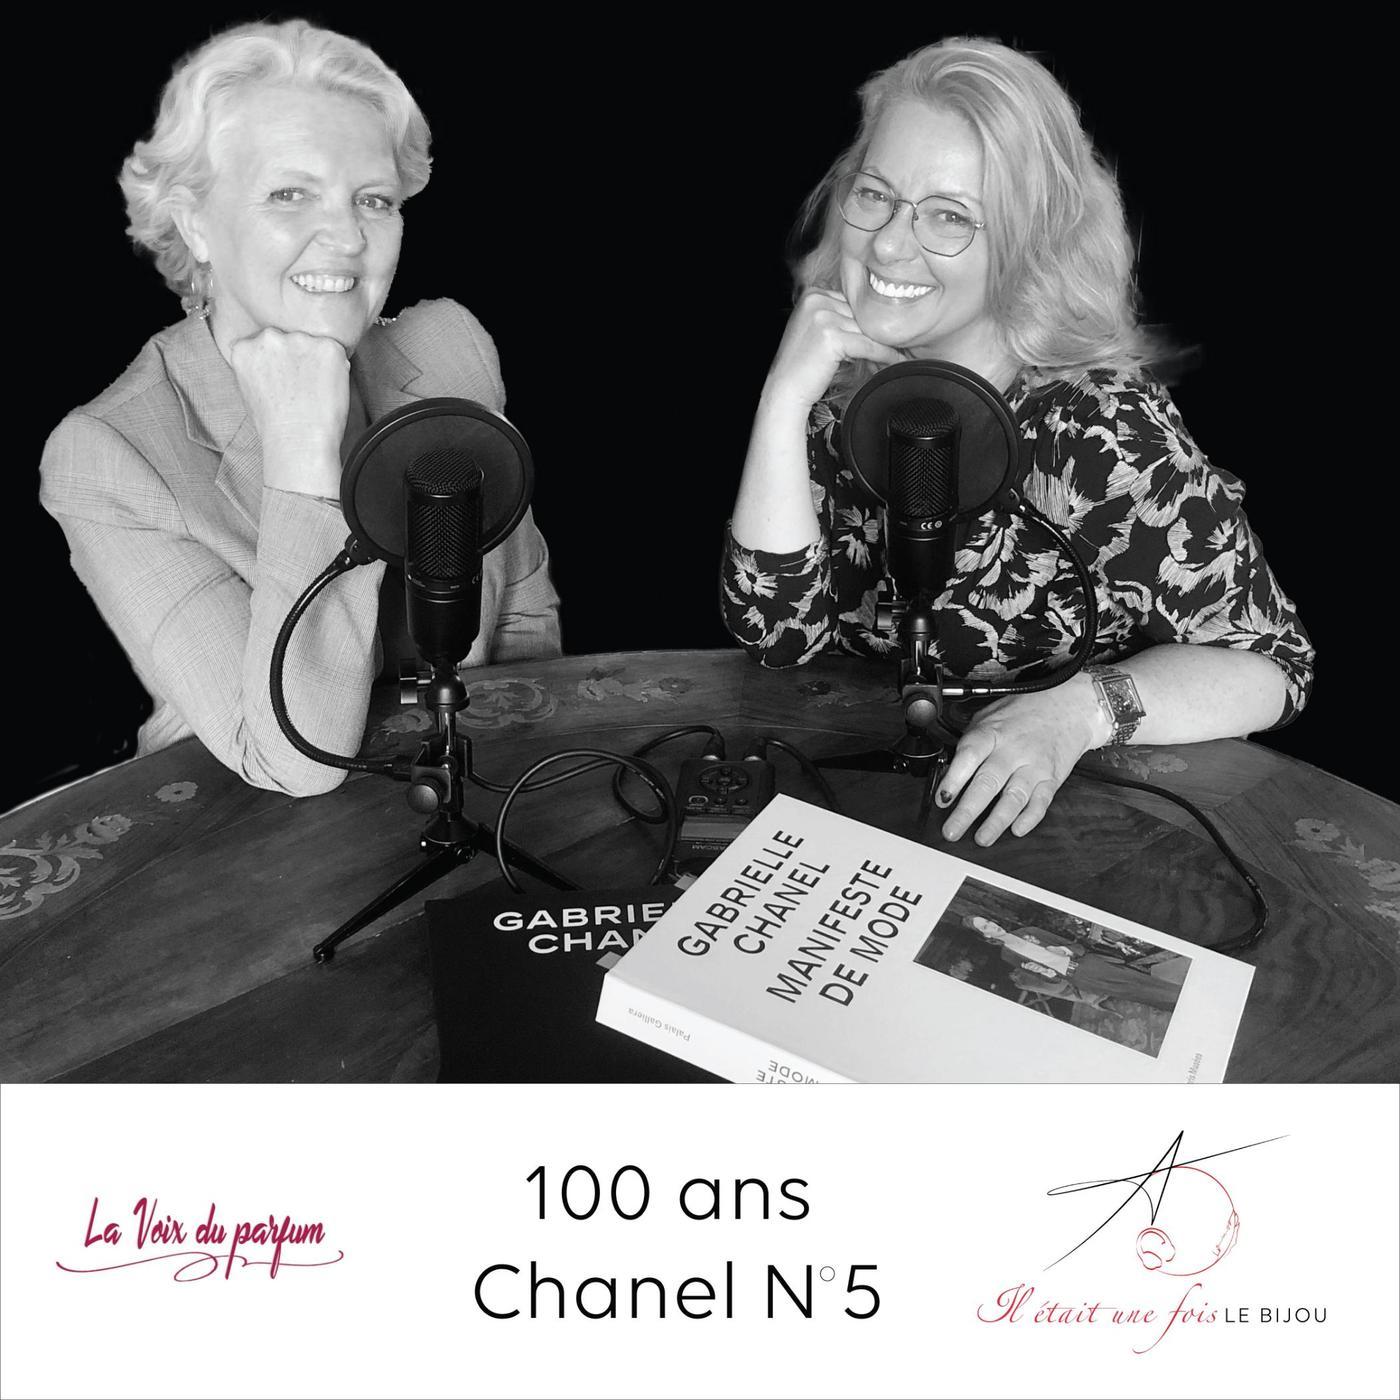 Spécial Chanel N°5 /100 ans